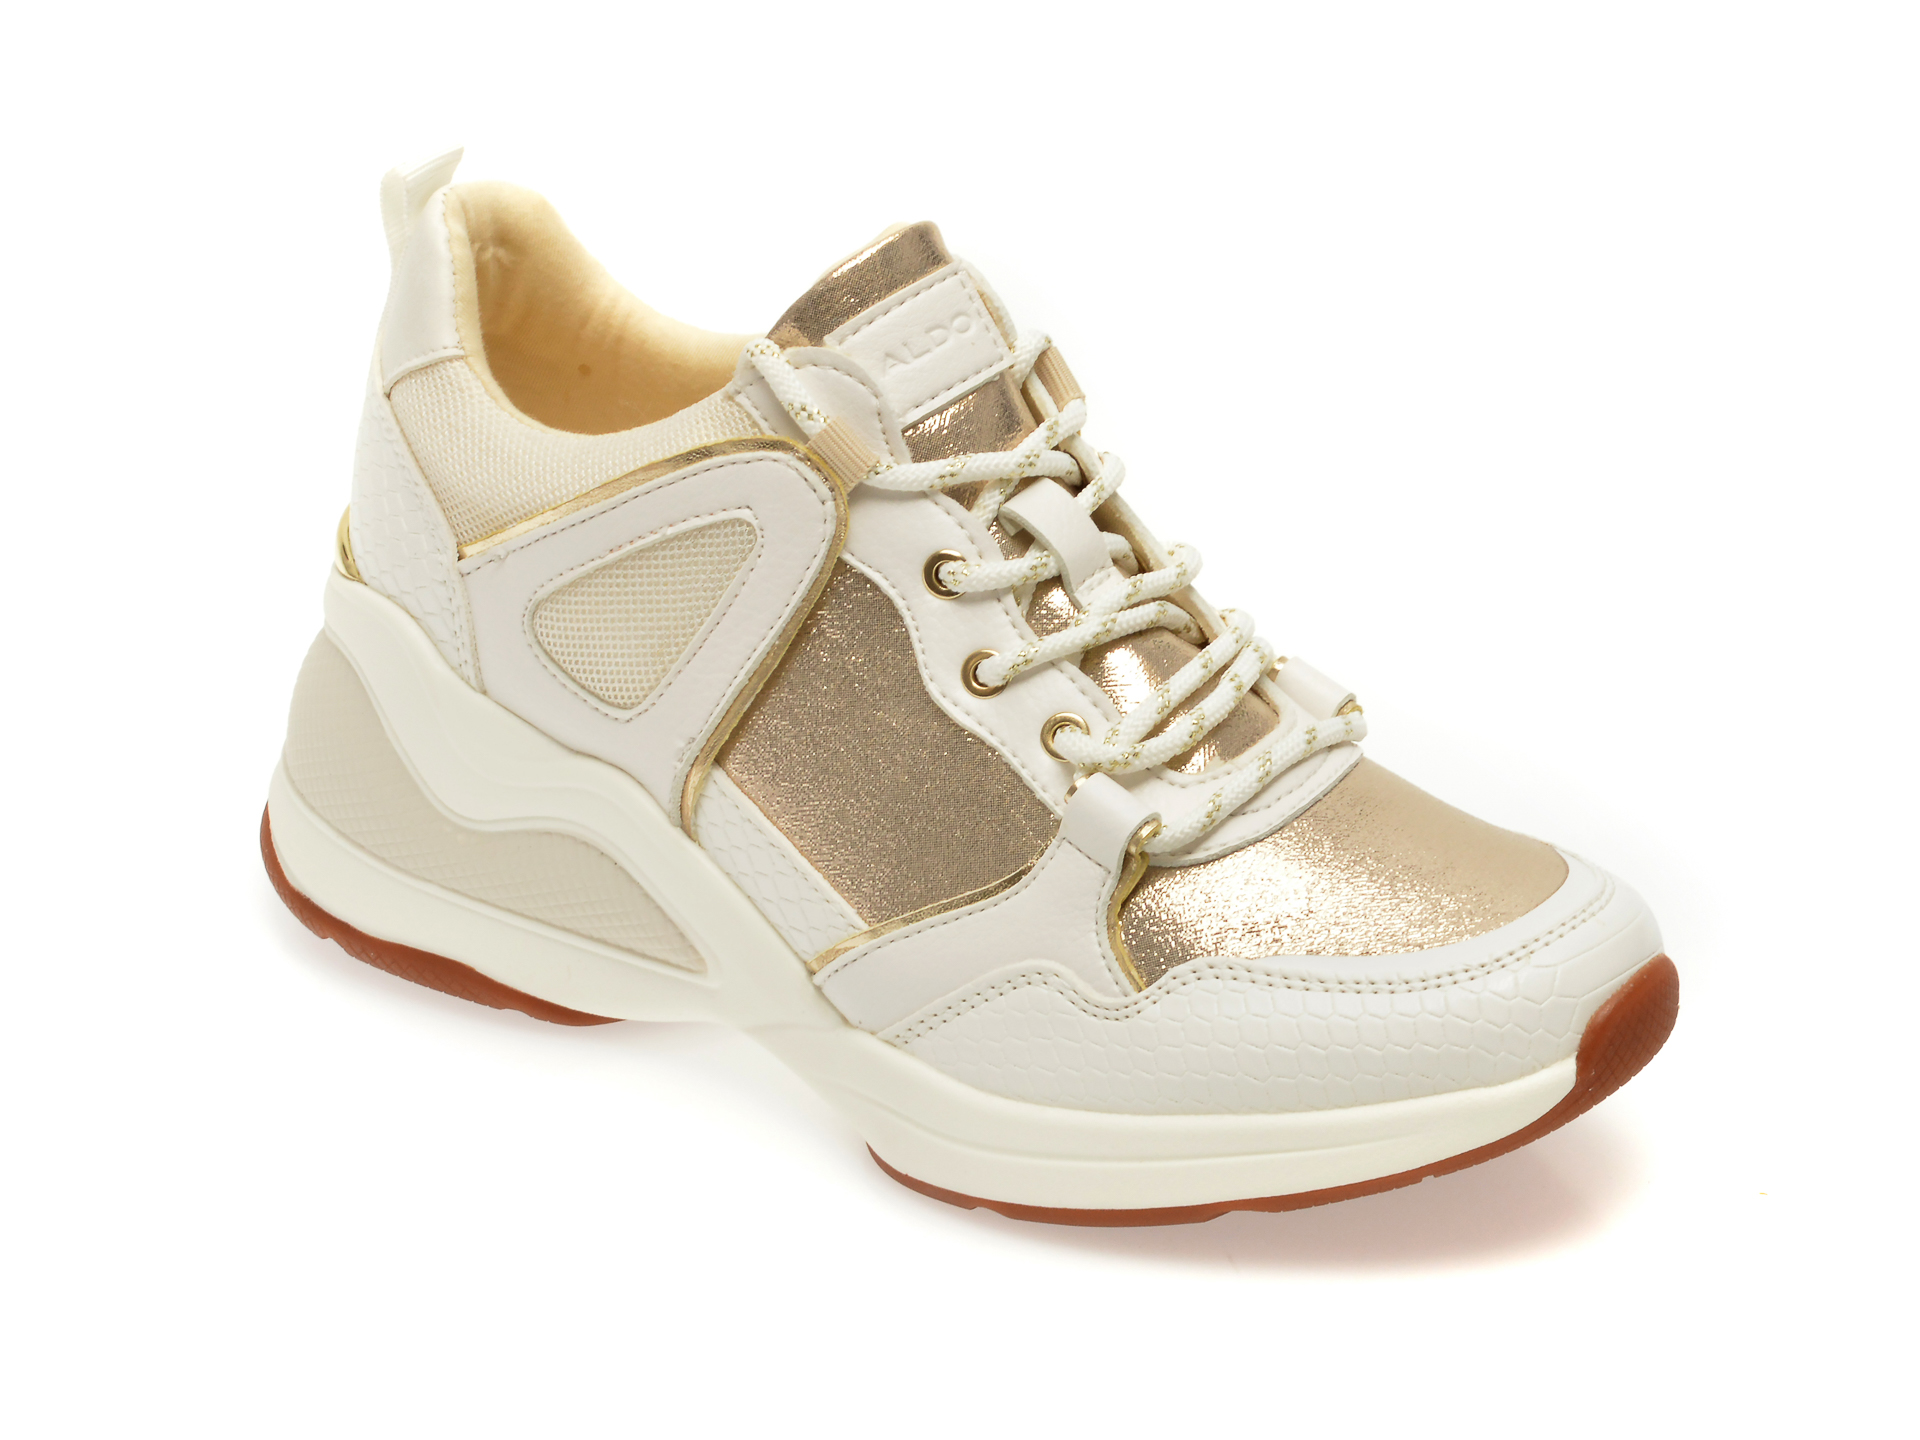 Pantofi Sport Aldo Albi, Vany710, Din Material Textil Si Piele Ecologica